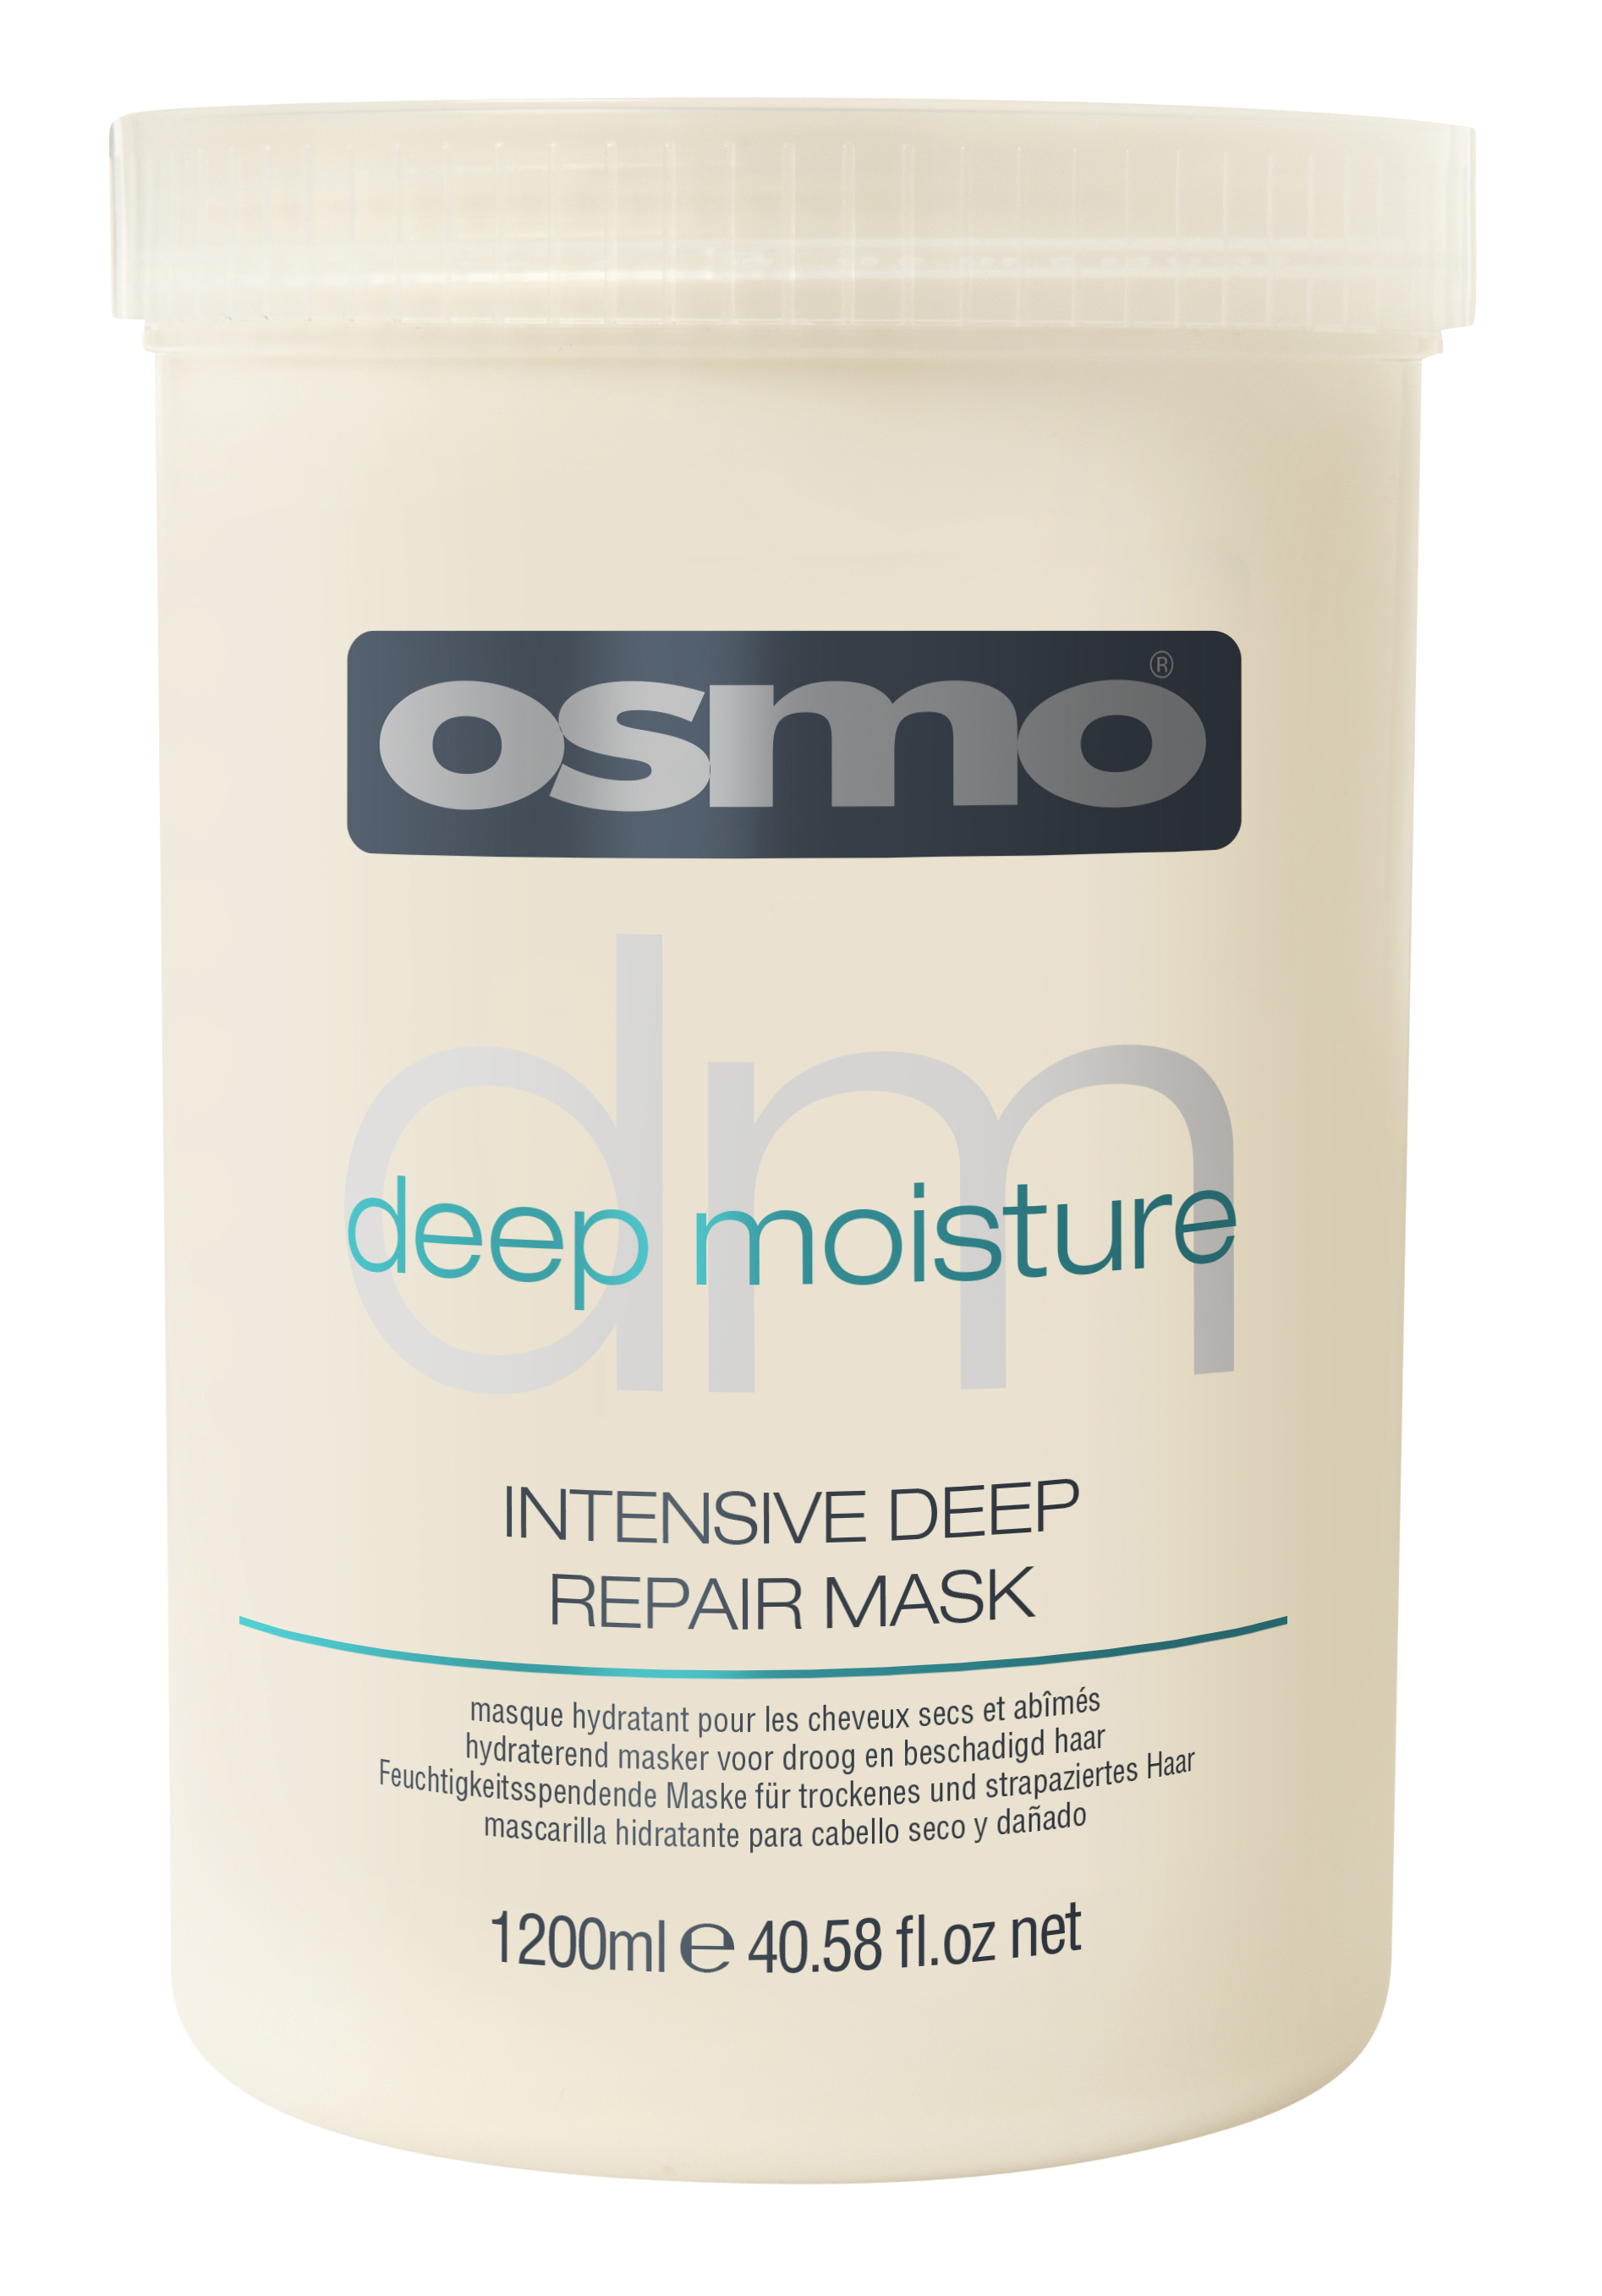 OSMO Маска Глубокое увлажнение / Intensive Deep Repair Mask 1200 мл